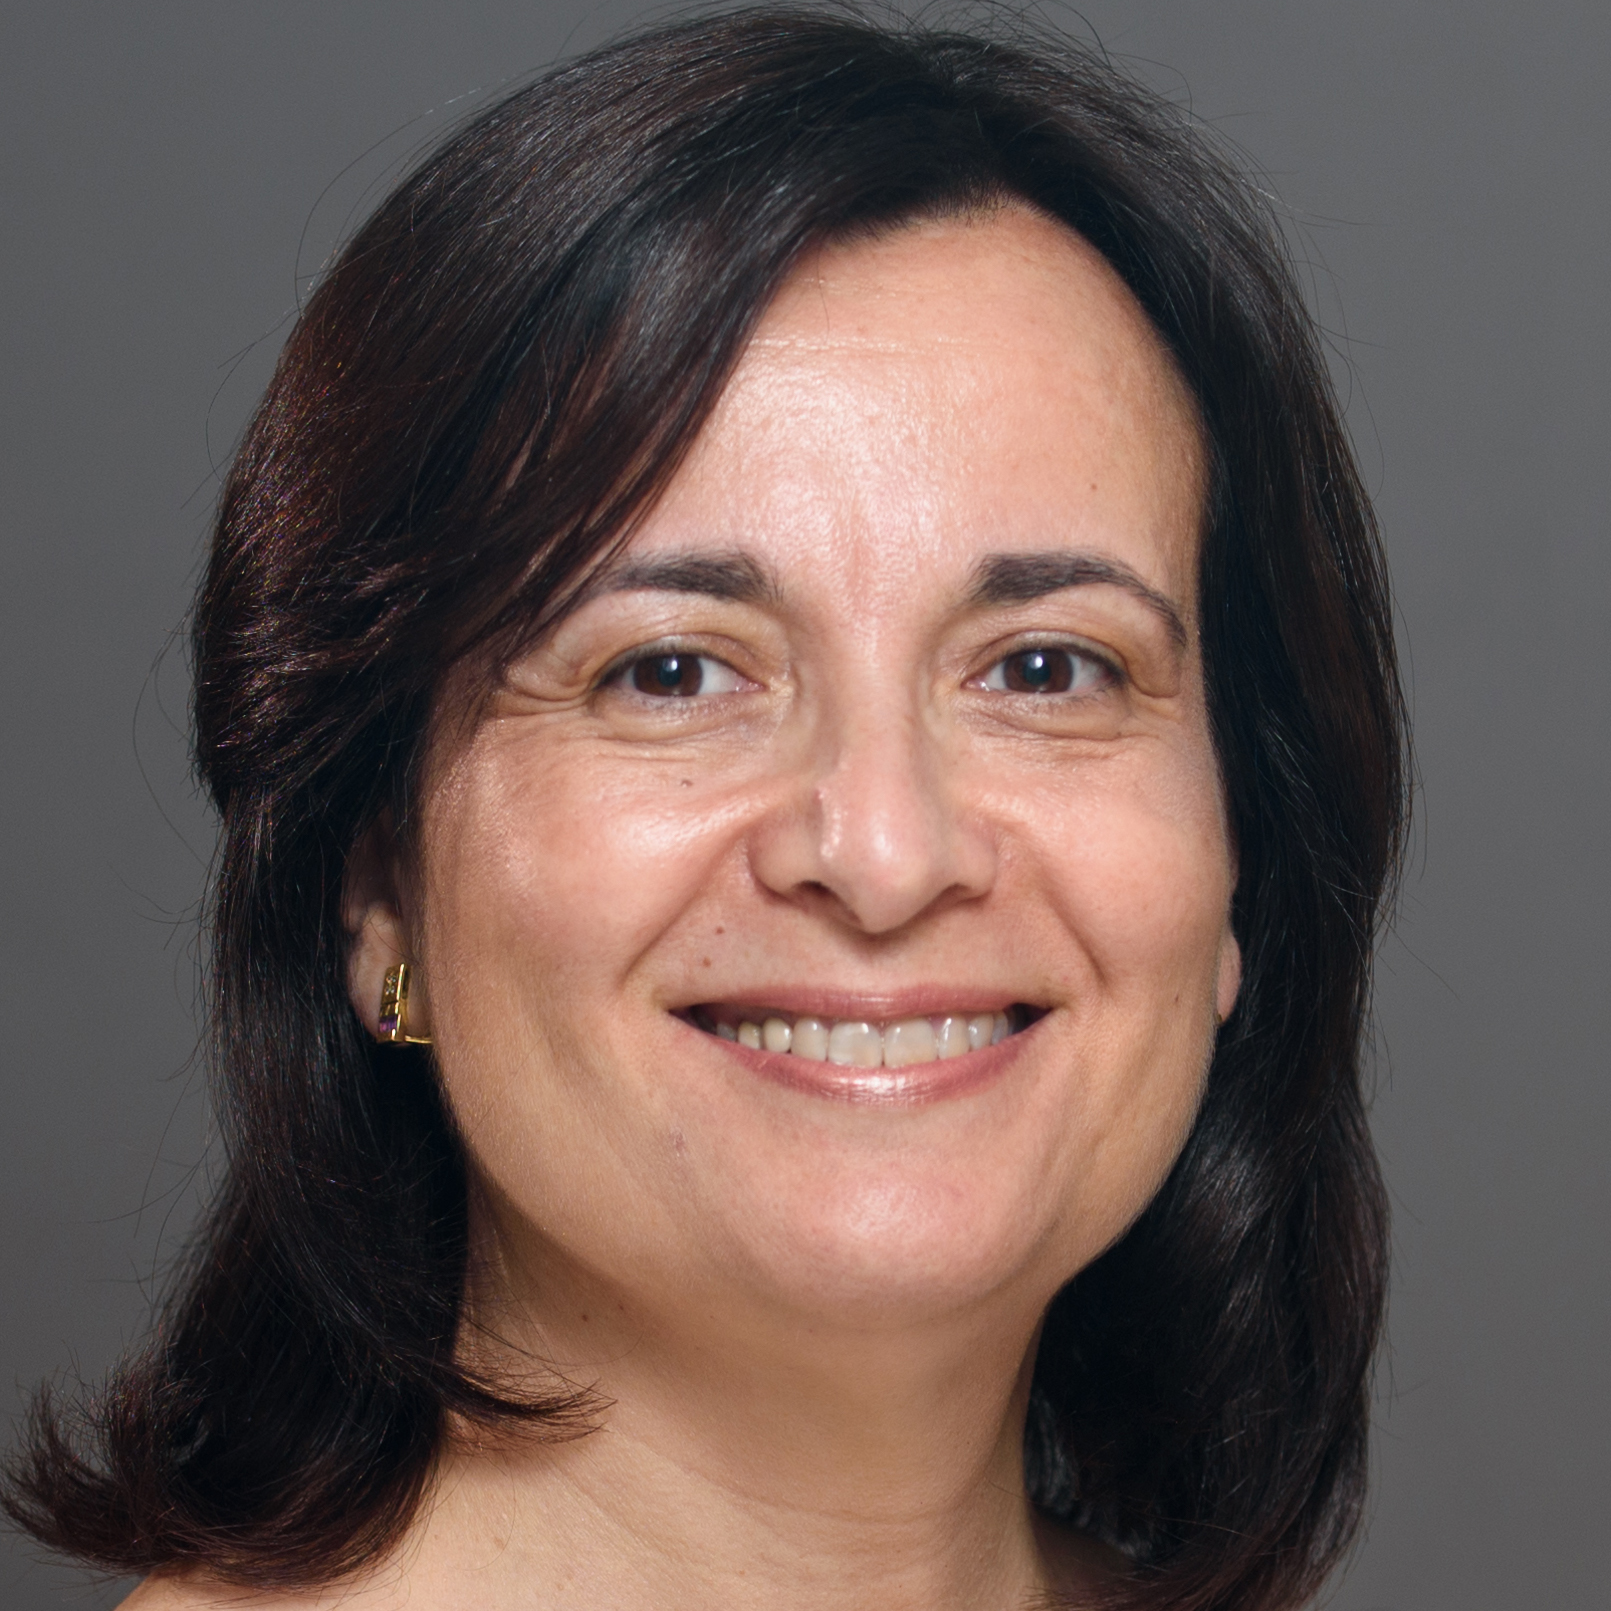 Pilar Sanjuán, madre de Guillem, 25 años